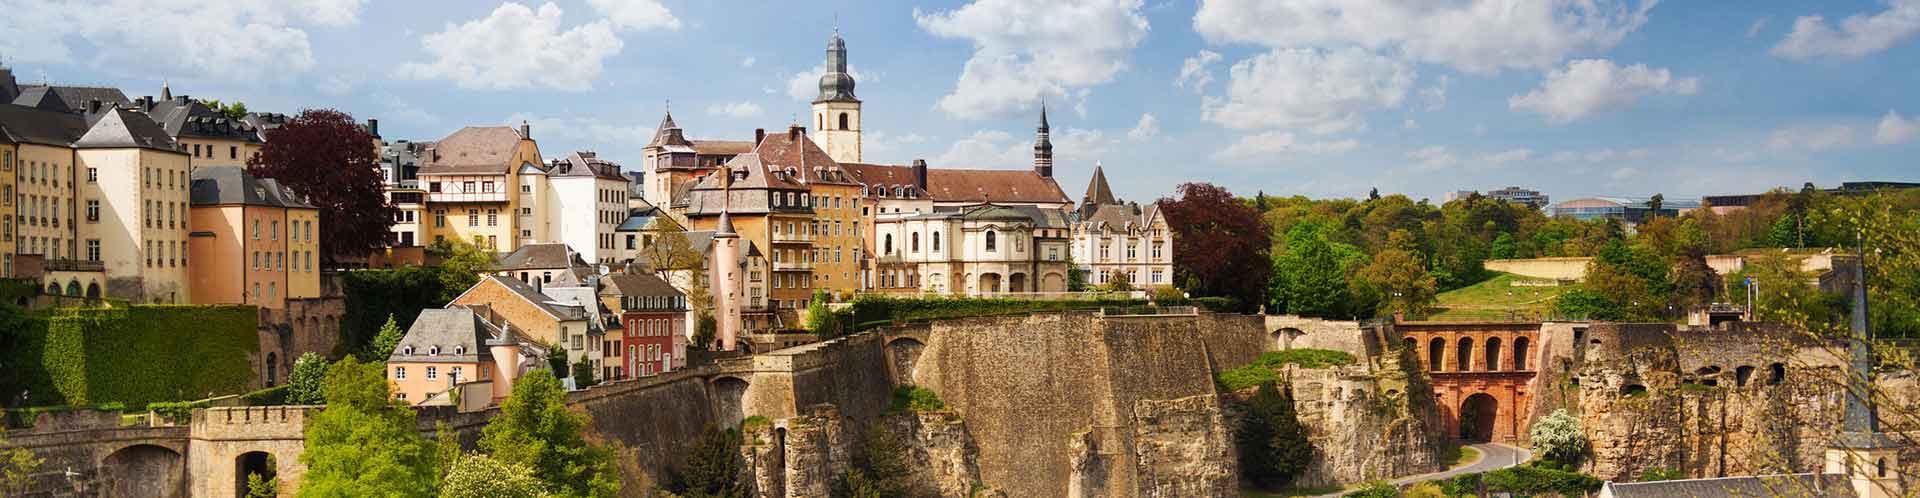 free tours luxemburgo